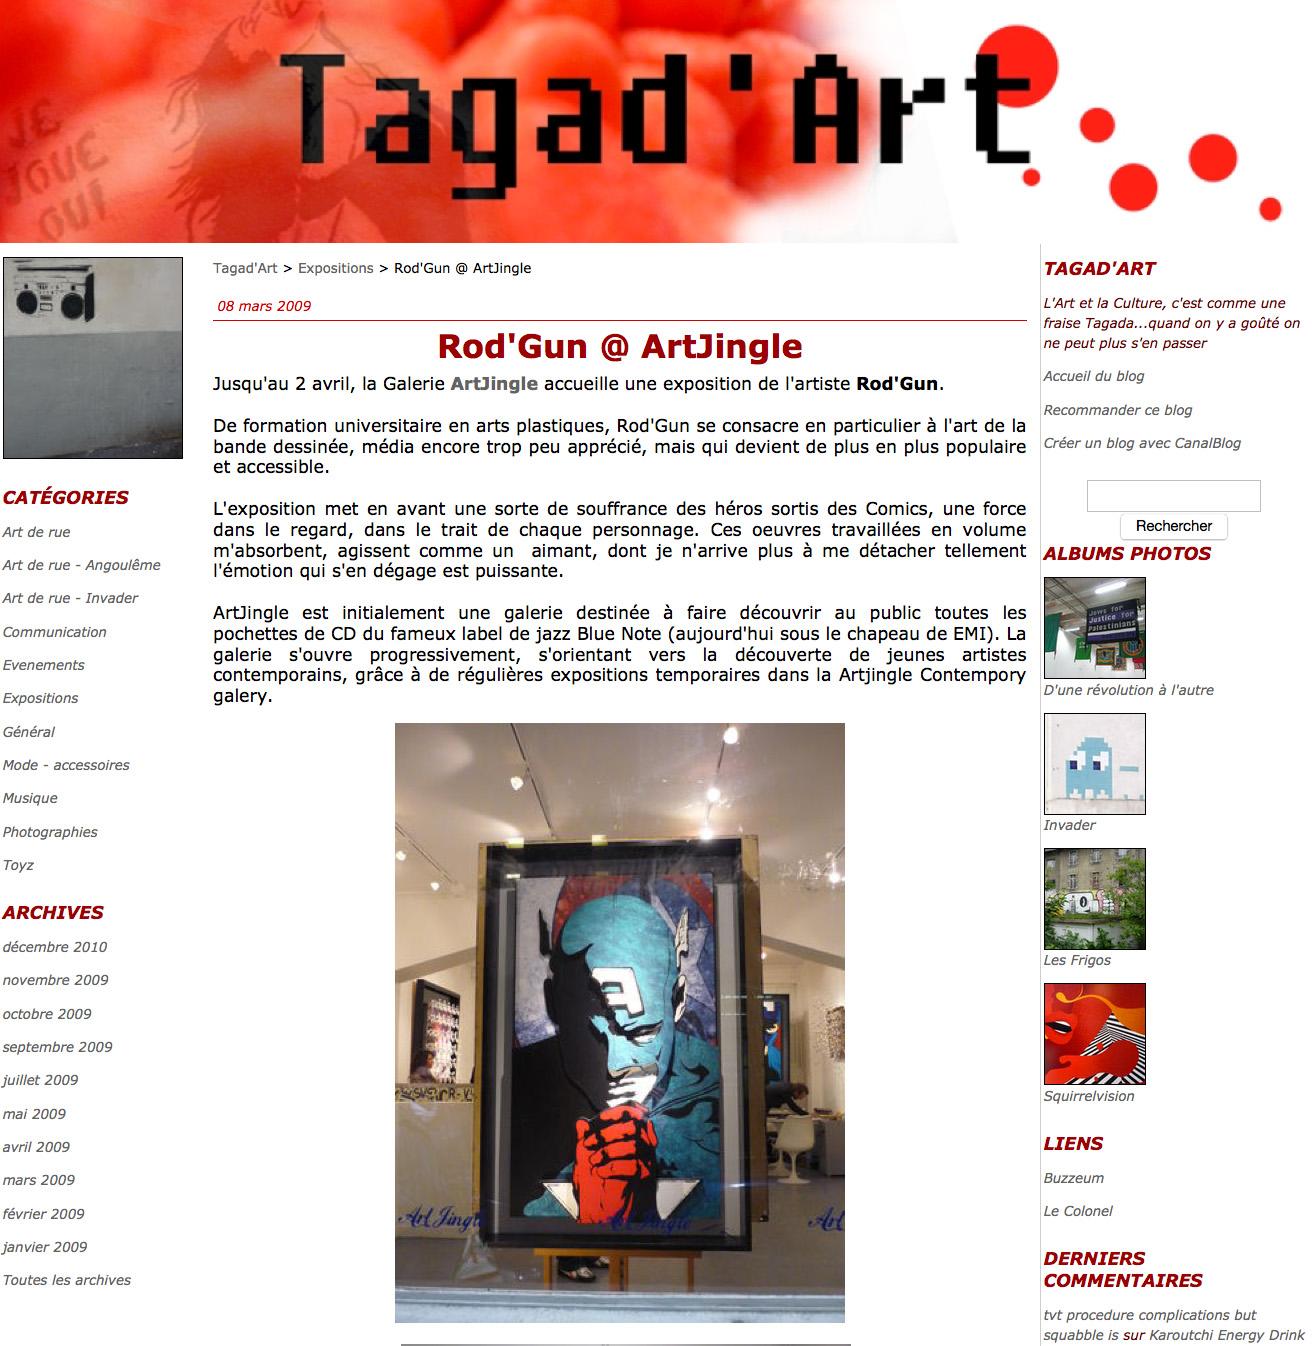 ROD TAGAD ART